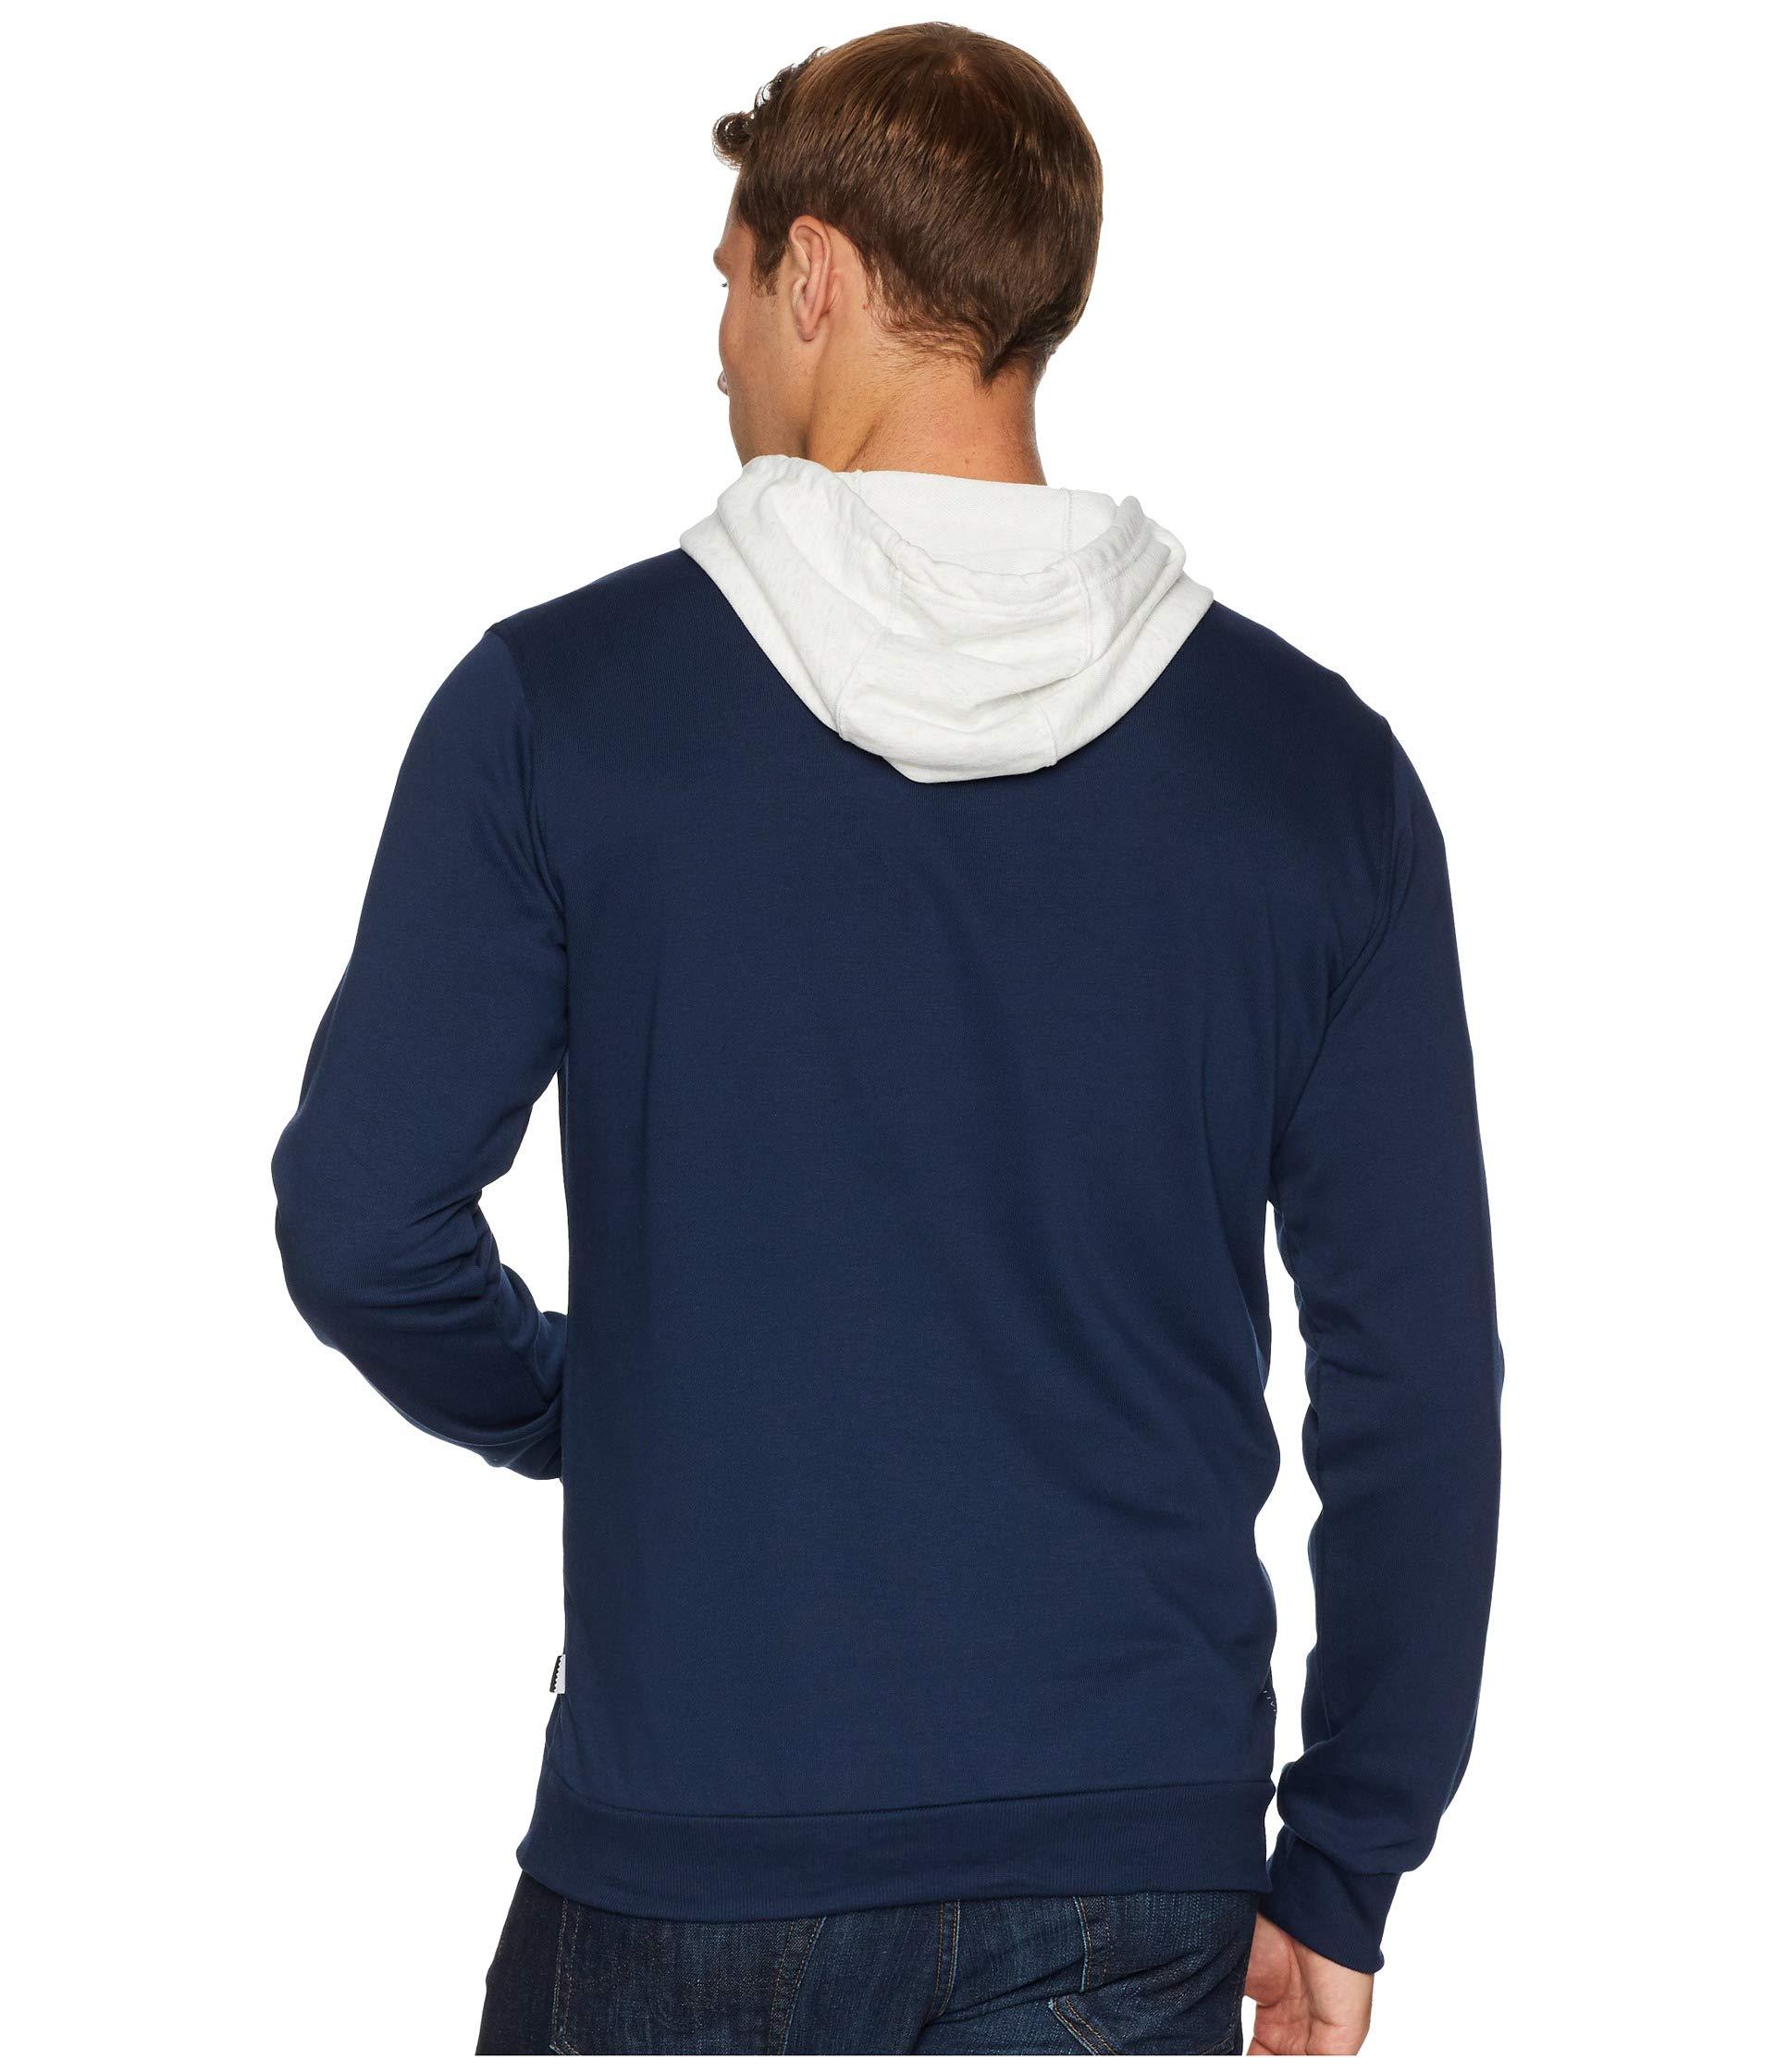 Melange Clima white pale Navy 0 Adidas 3 Collegiate Hoodie Skateboarding 8xqqOvSw